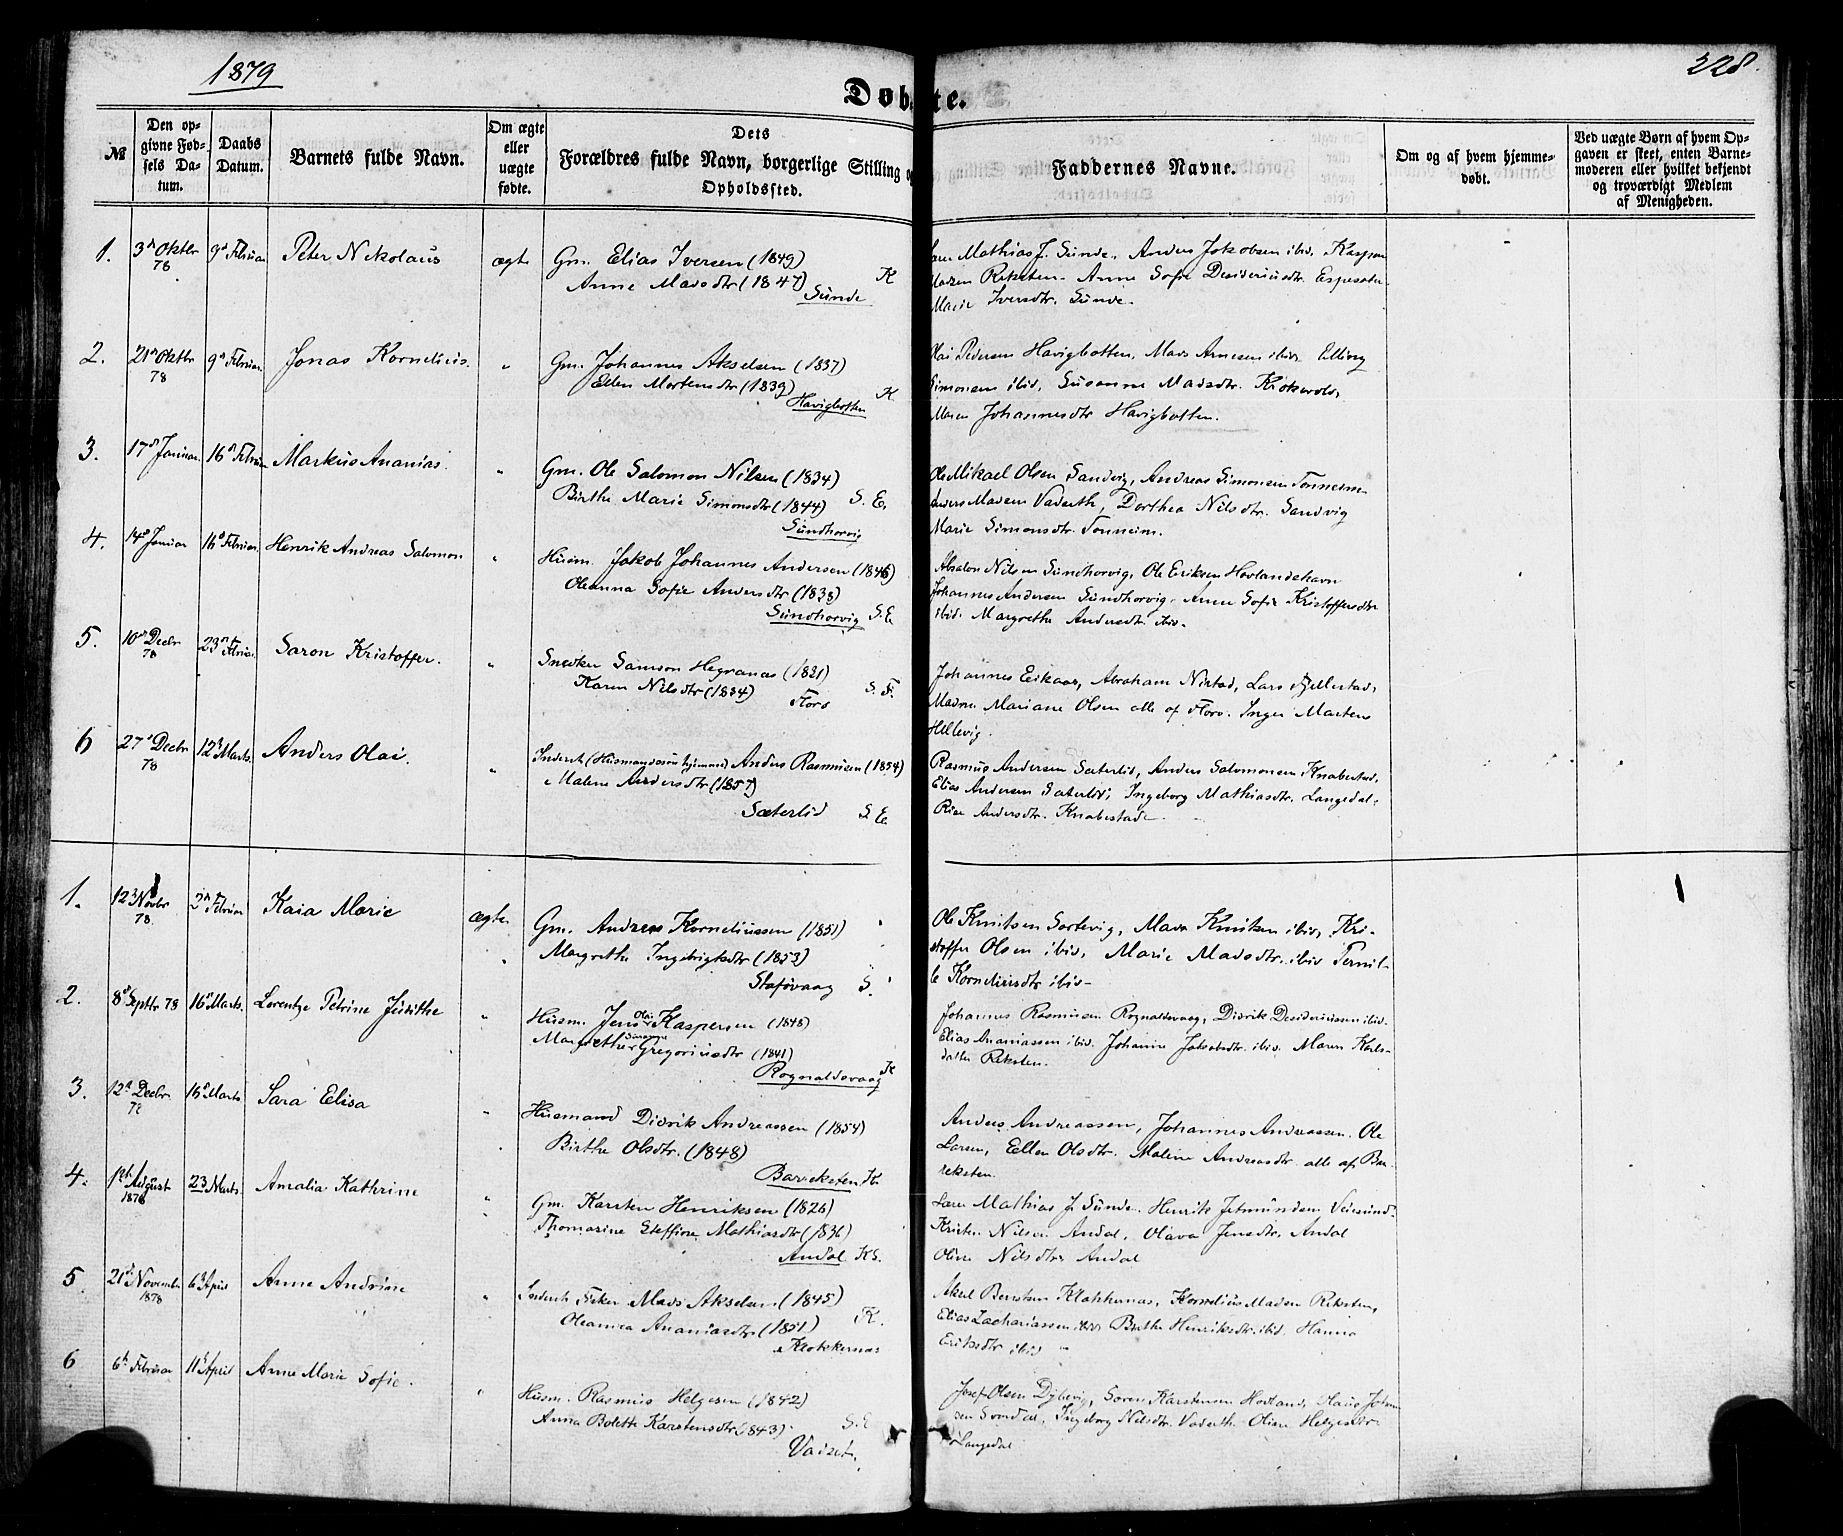 SAB, Kinn sokneprestembete, H/Haa/Haaa/L0006: Ministerialbok nr. A 6, 1857-1885, s. 228